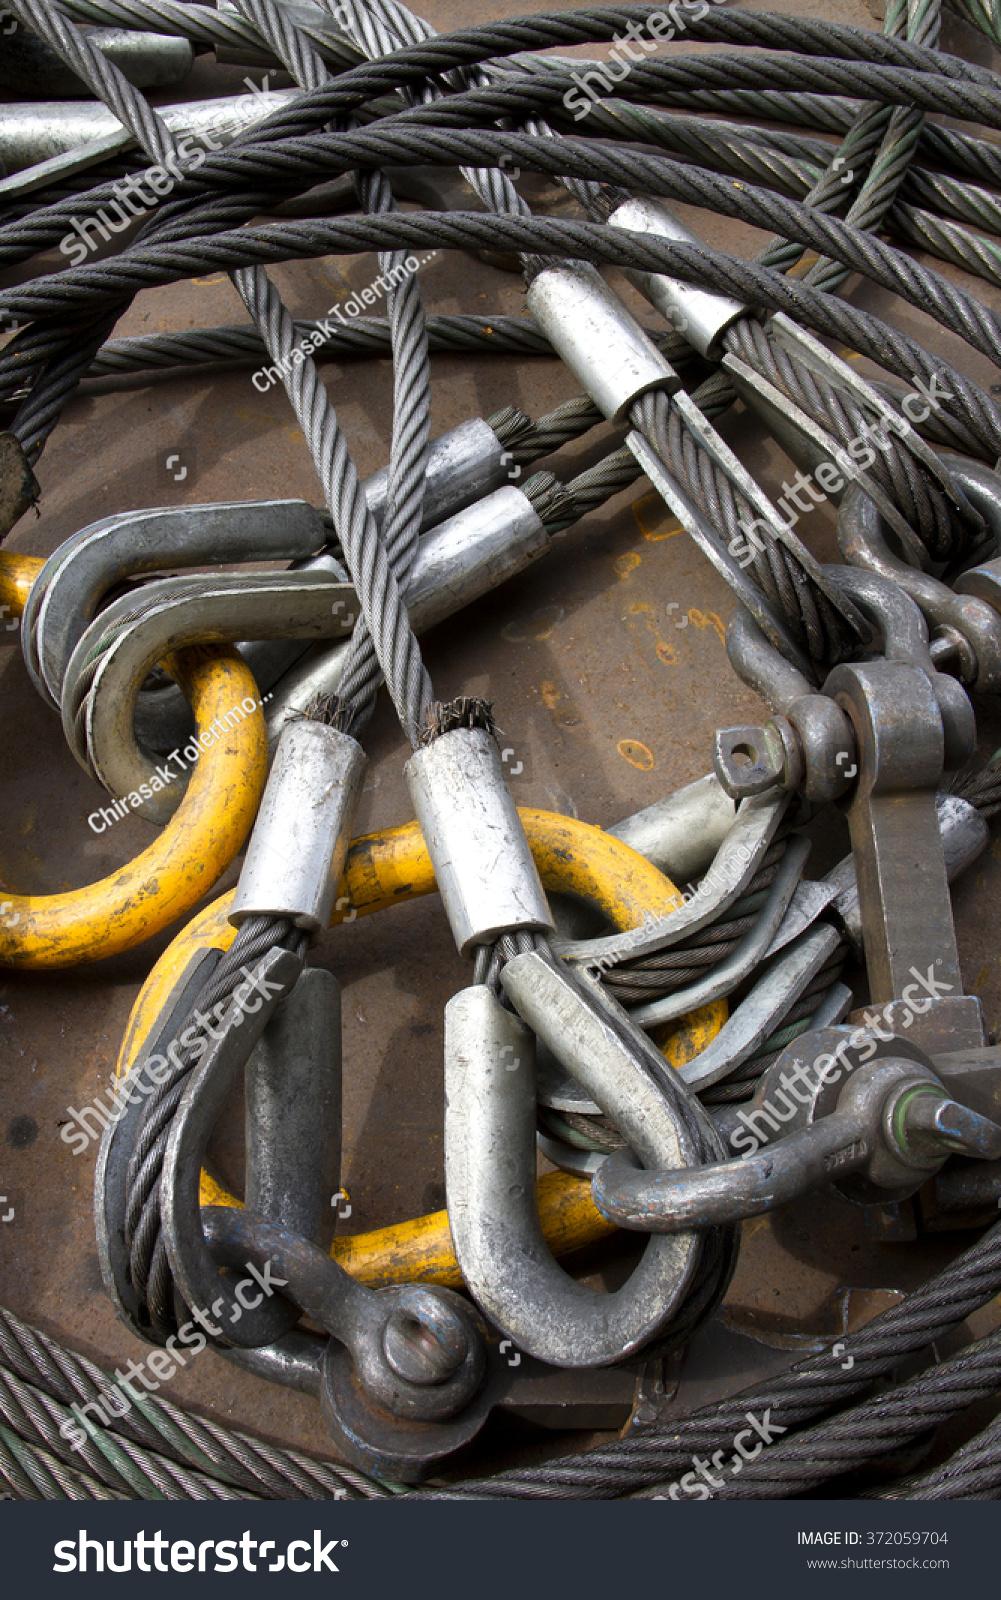 Heavy Duty Steel Wire Rope Sling Stock Photo (Edit Now) 372059704 ...